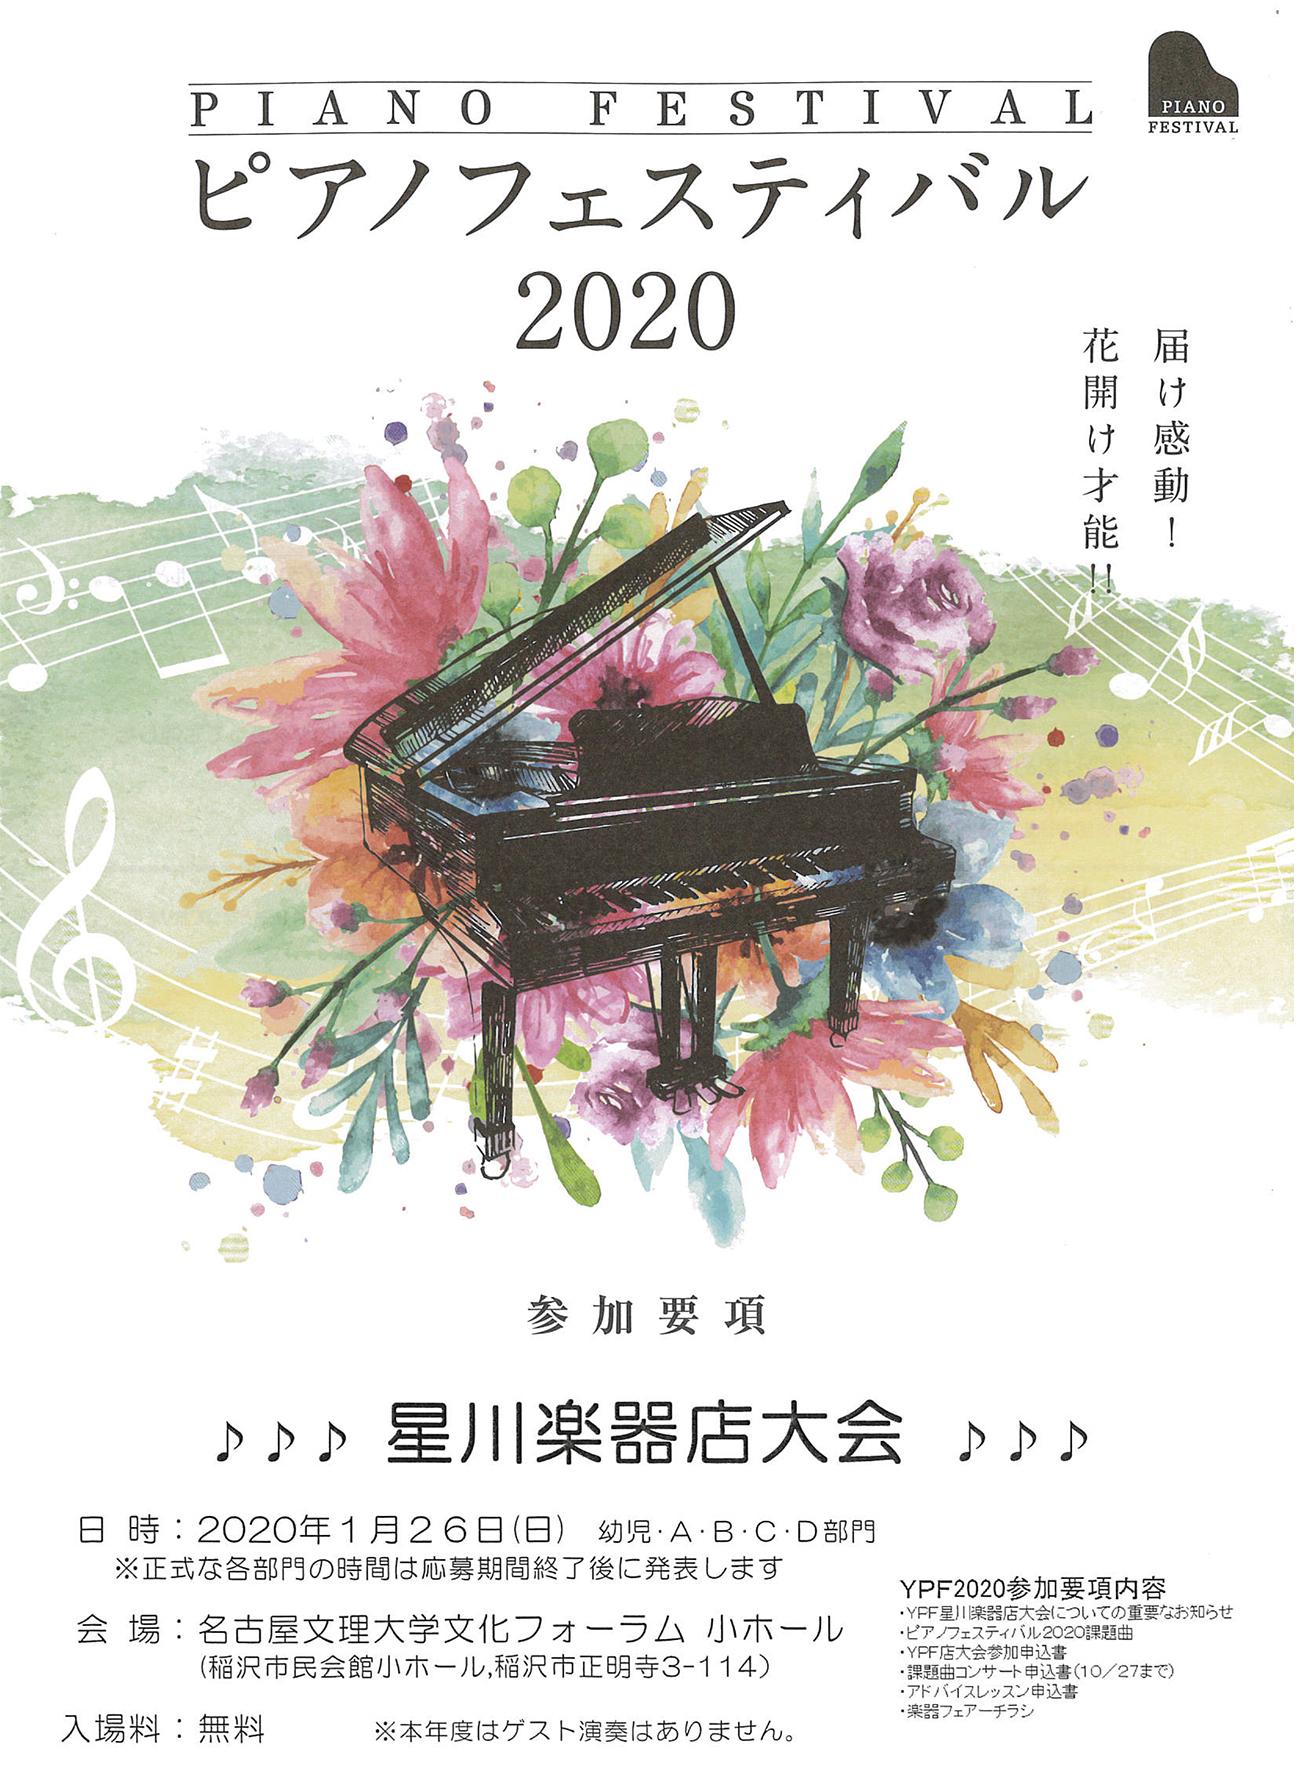 pianofestival202001